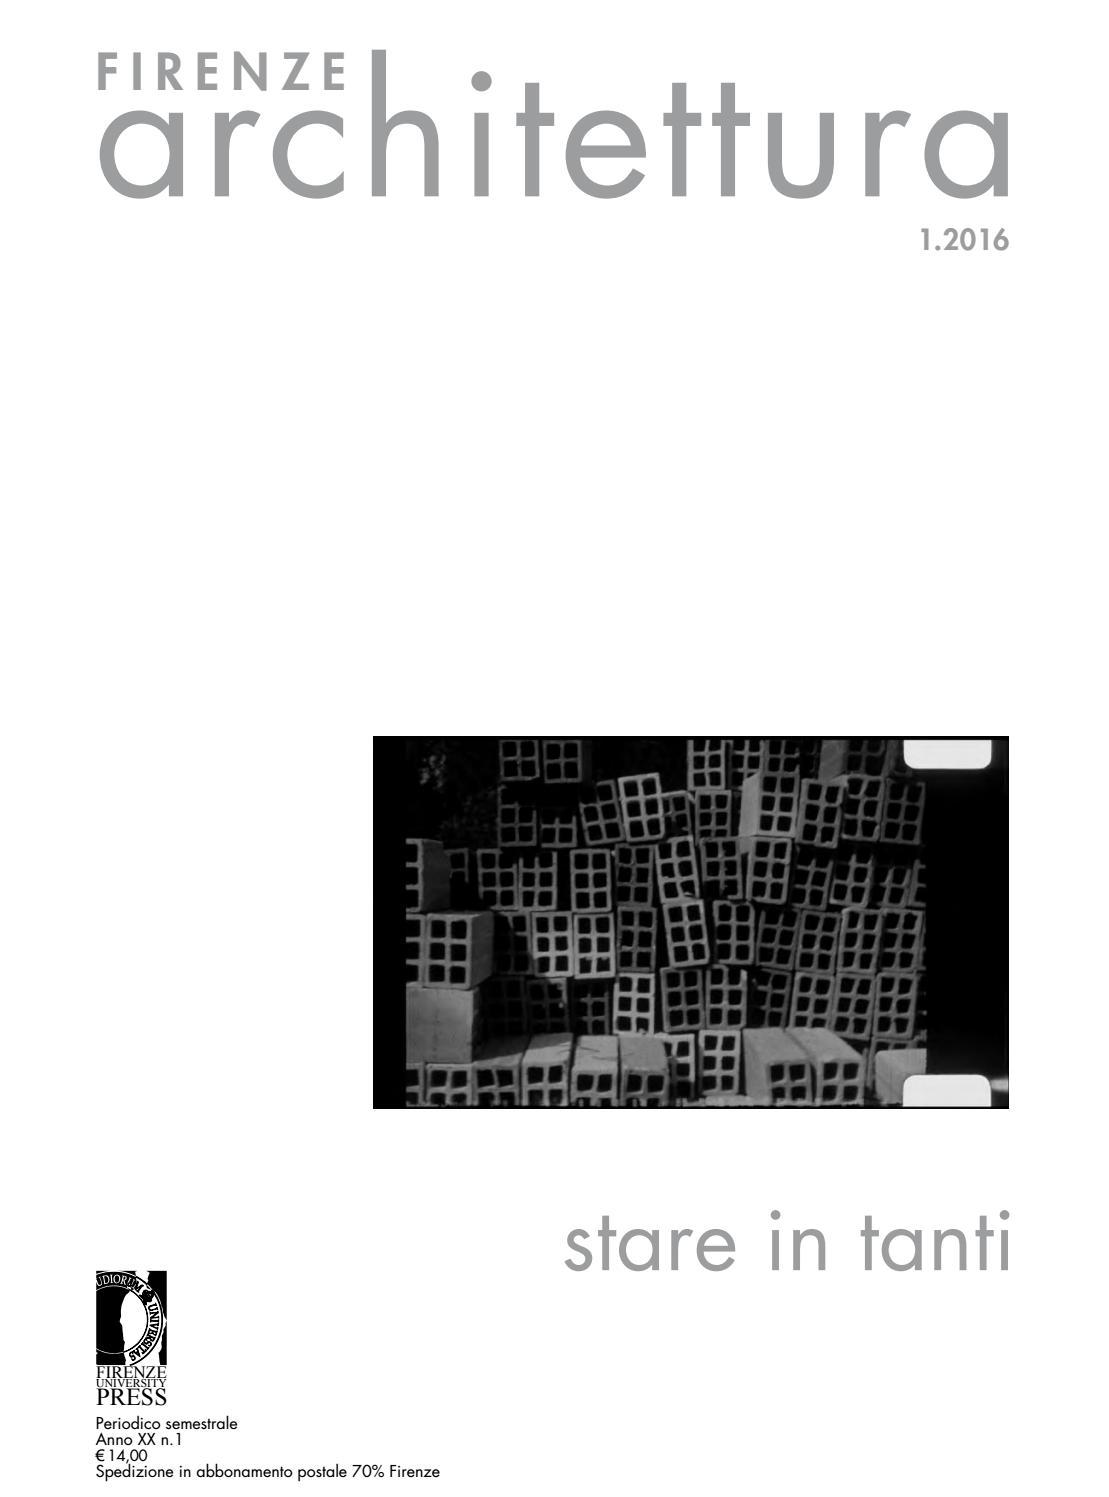 Firenze architettura 2016 1 by dida issuu for Architettura olandese